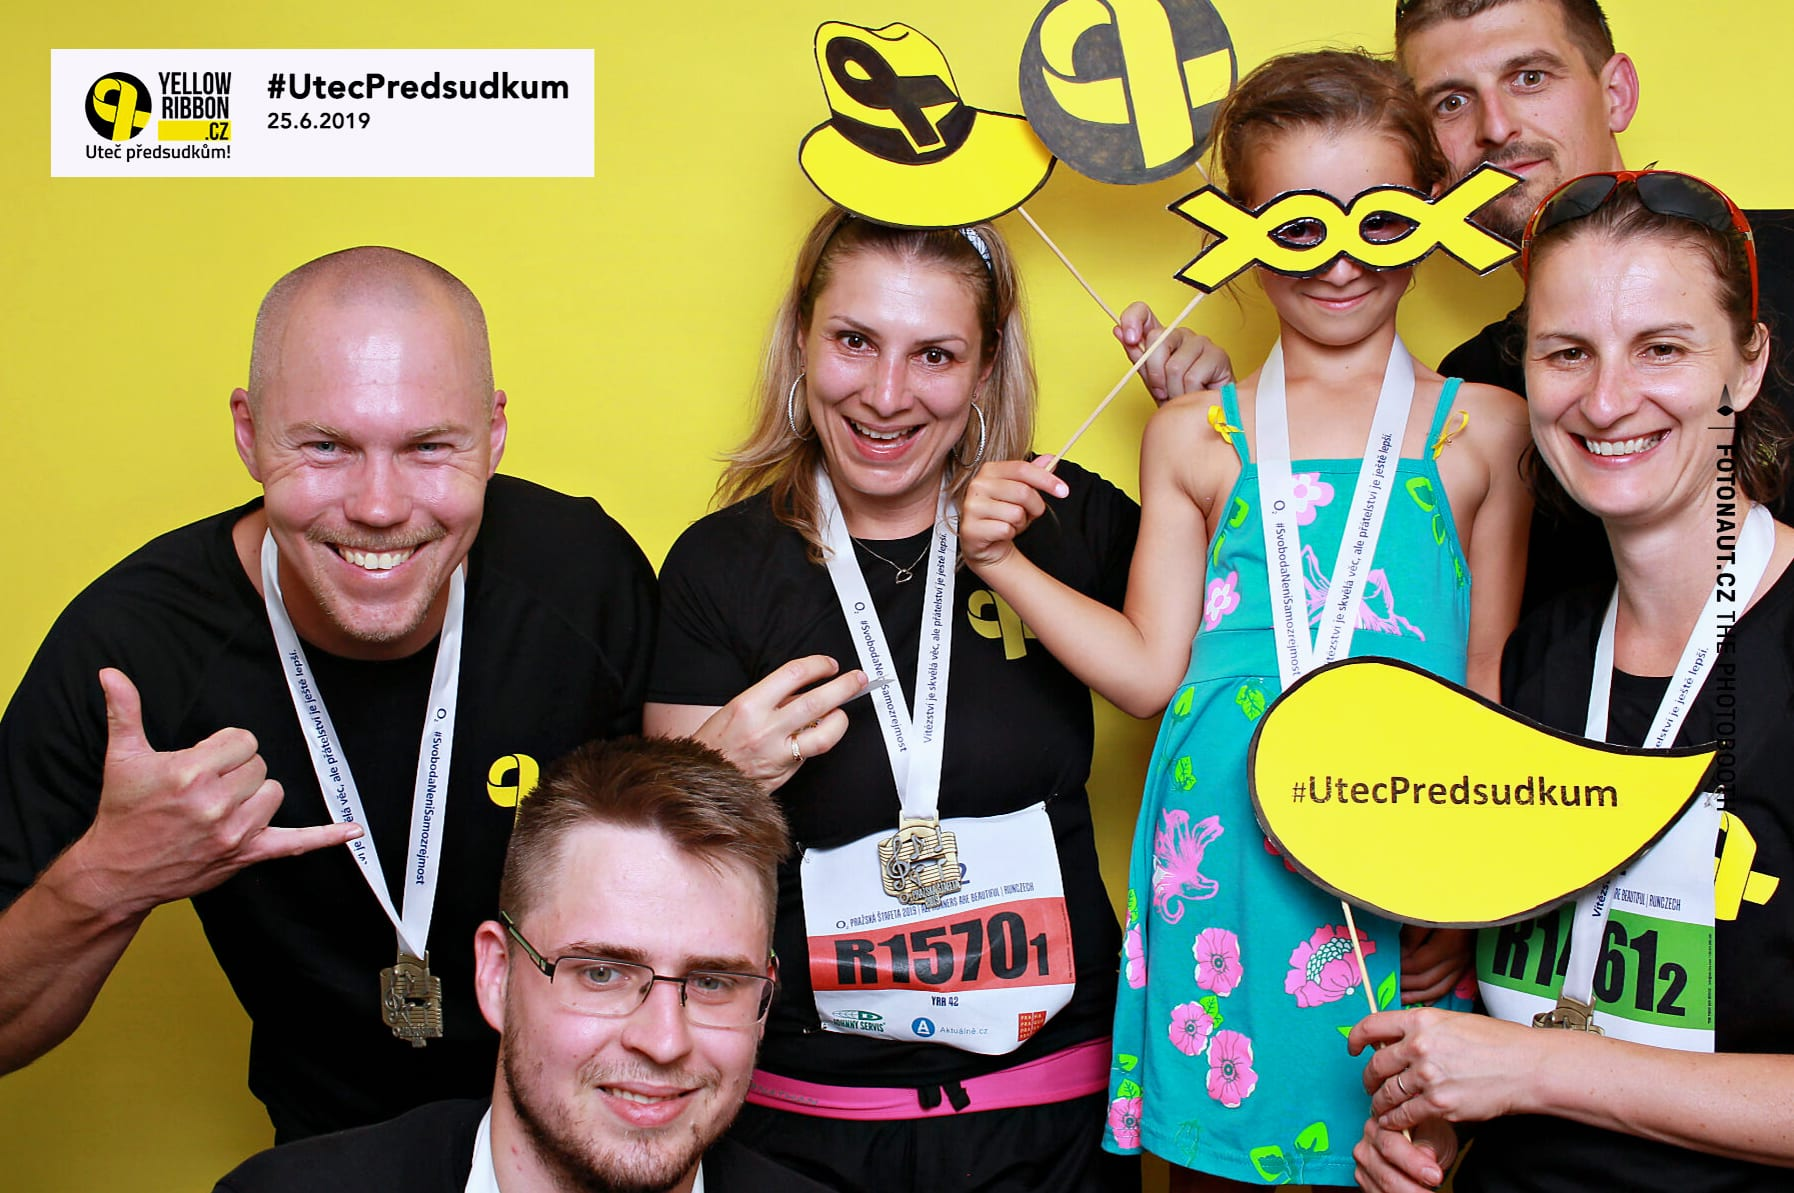 fotokoutek-festival-praha-yellow-ribbon-25-6-2019-638183